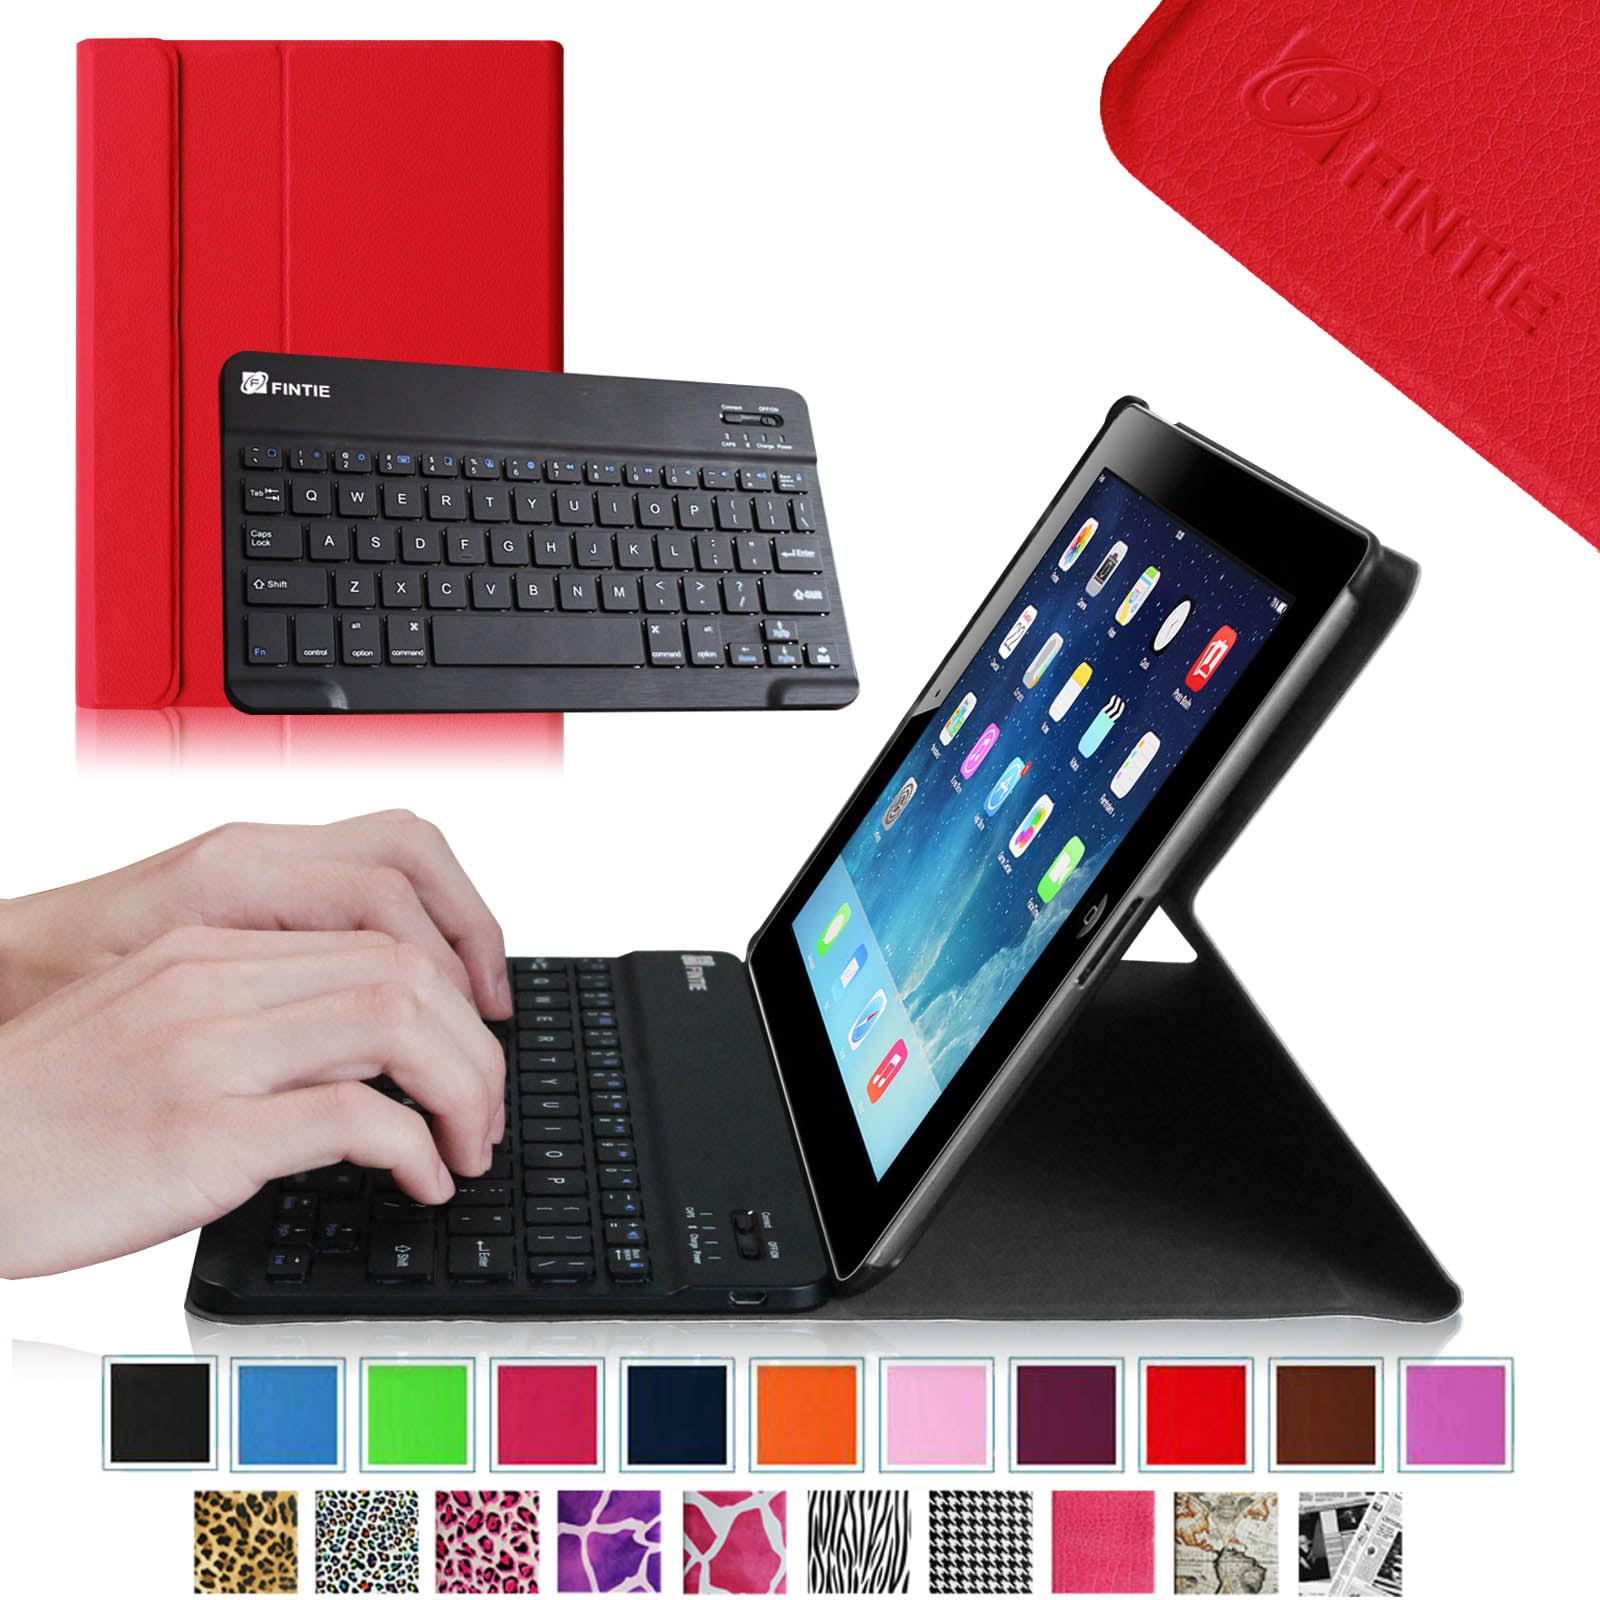 Apple iPad 4, iPad 3 & iPad 2 Keyboard Case - Fintie SmartShell Stand Cover with Detachable Bluetooth Keyboard, Red